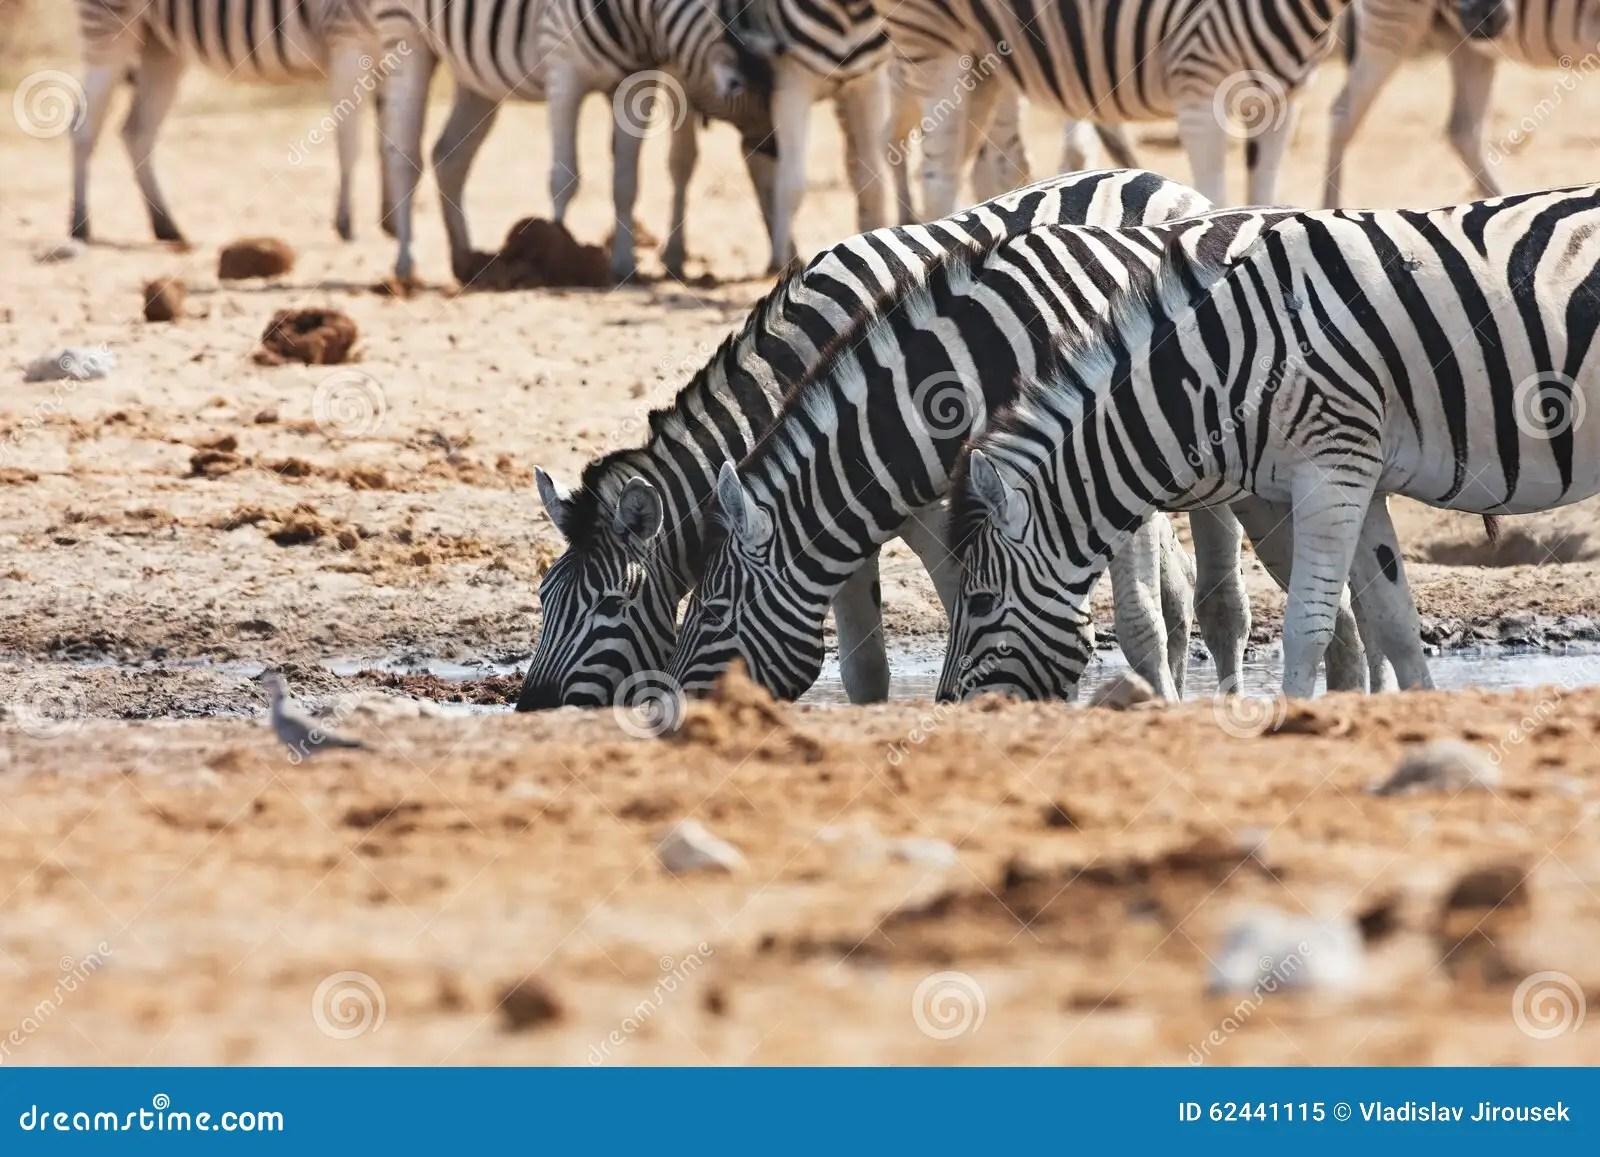 Damara Zebras And Giraffes At The Waterhole Etosha